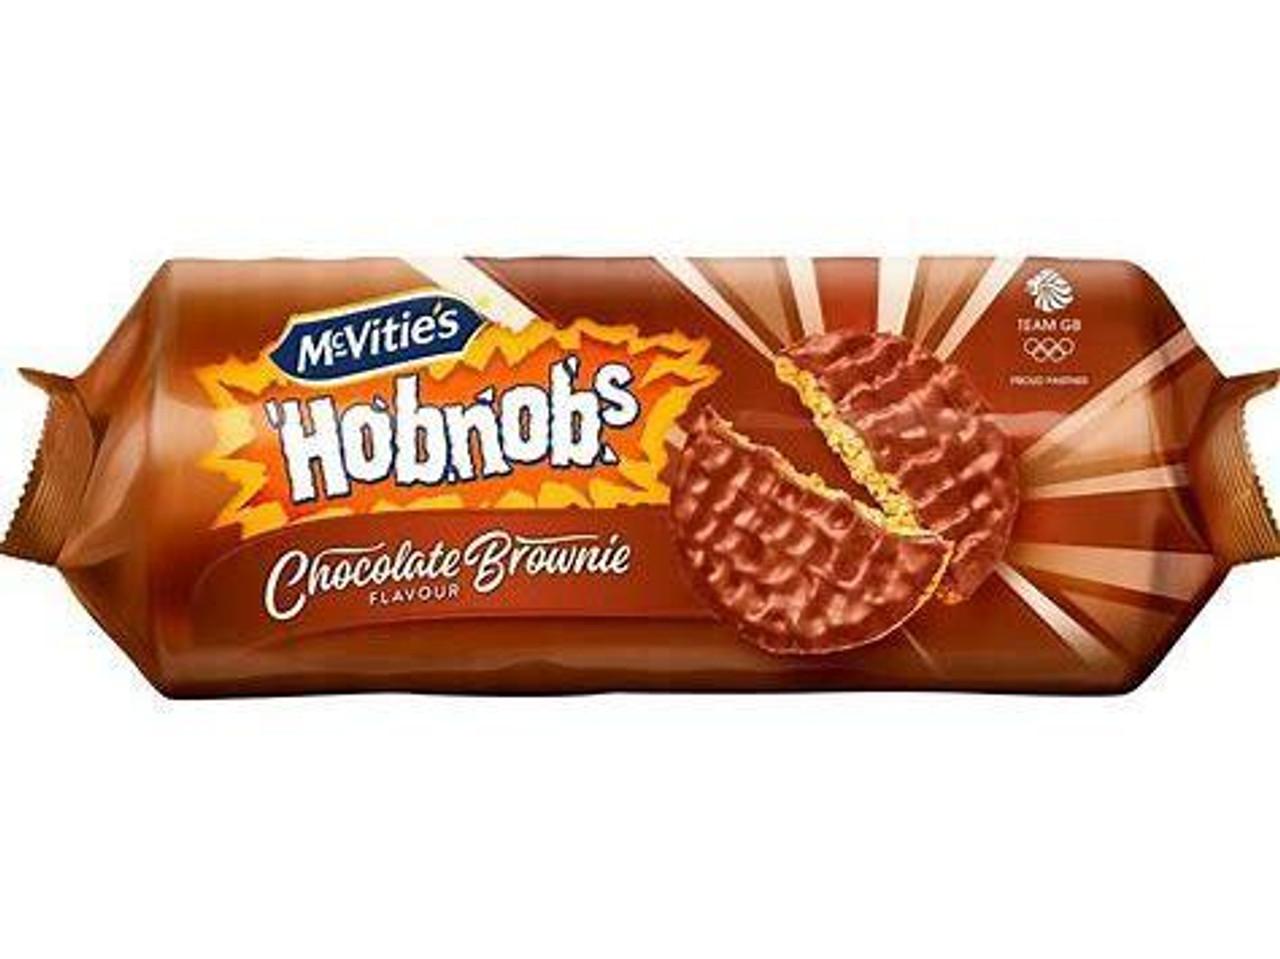 McVitie's Hob Nob Chocolate Brownie 262g